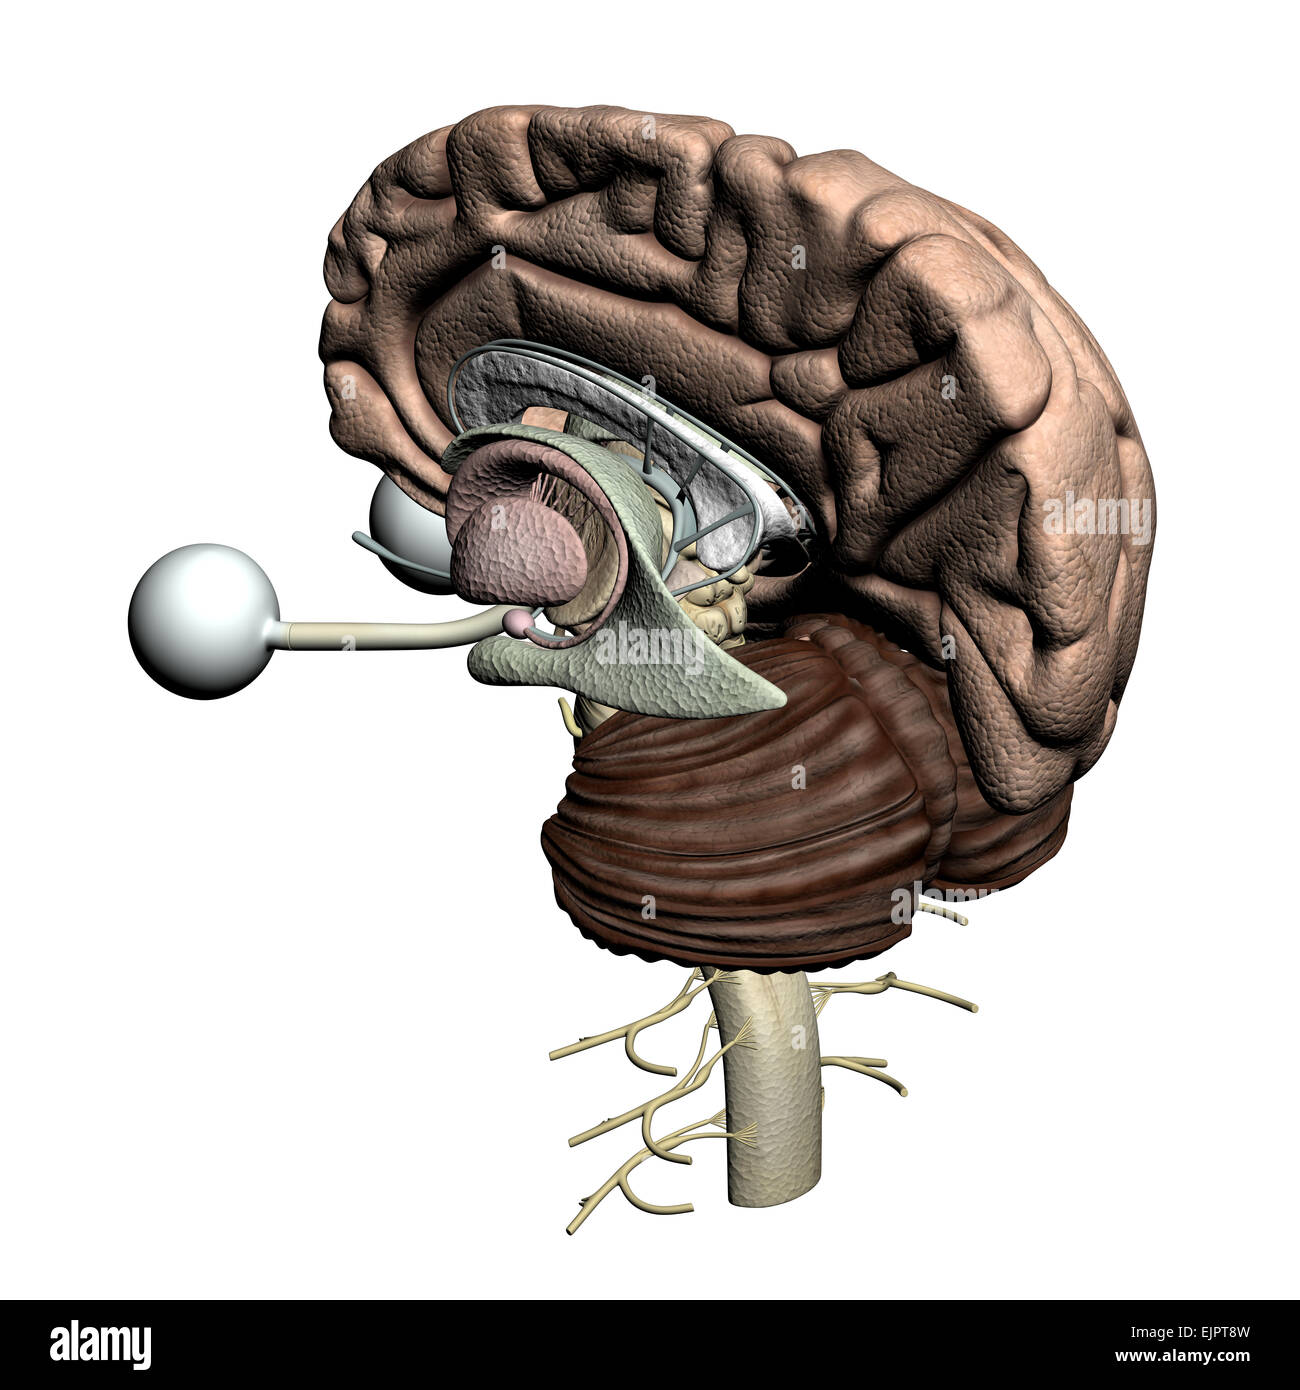 Cross Section Of The Brain Imágenes De Stock & Cross Section Of The ...